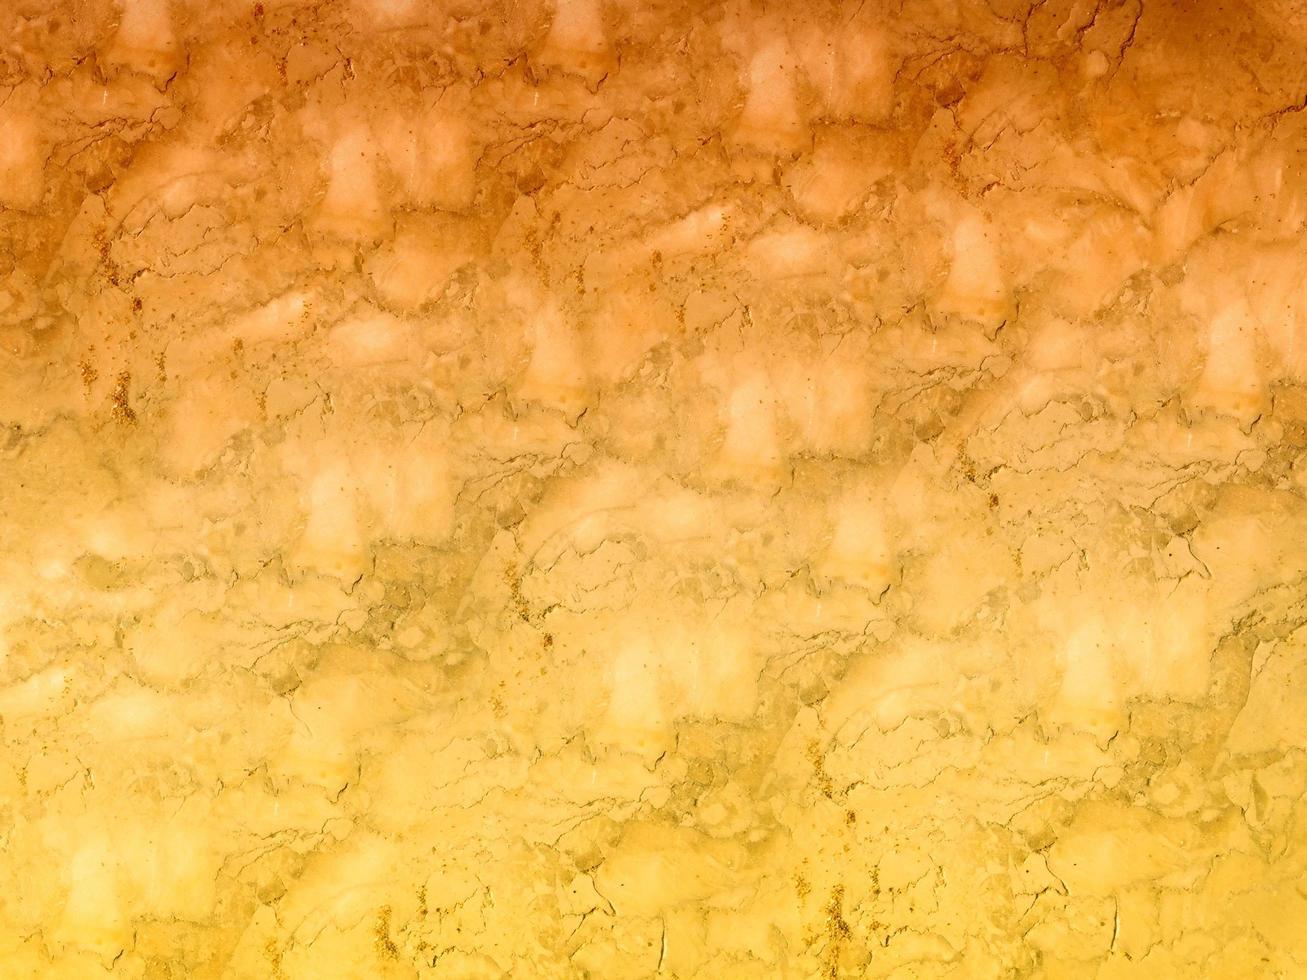 texture de marbre en plein air photo